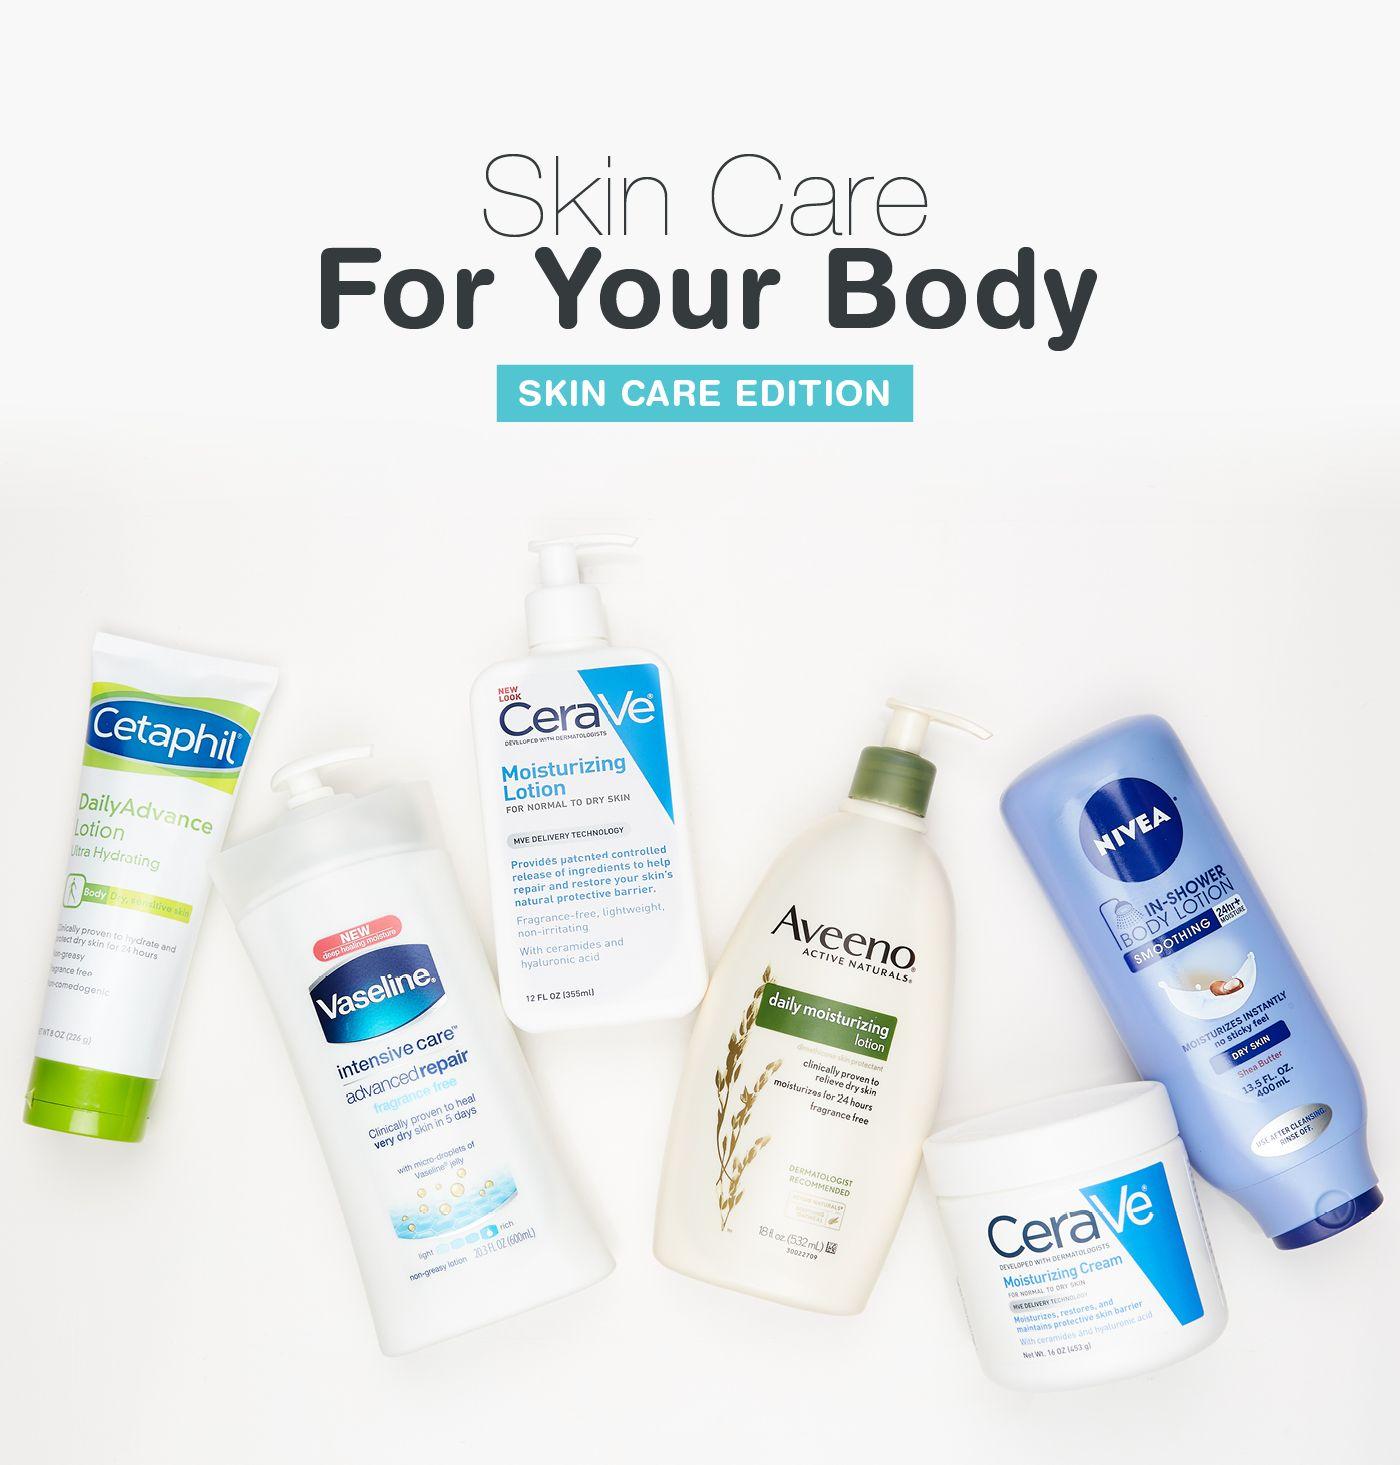 Buy 2 Get 3rd Free Skin Care Walgreens Skin Care Free Skin Care Products Makeup Skin Care